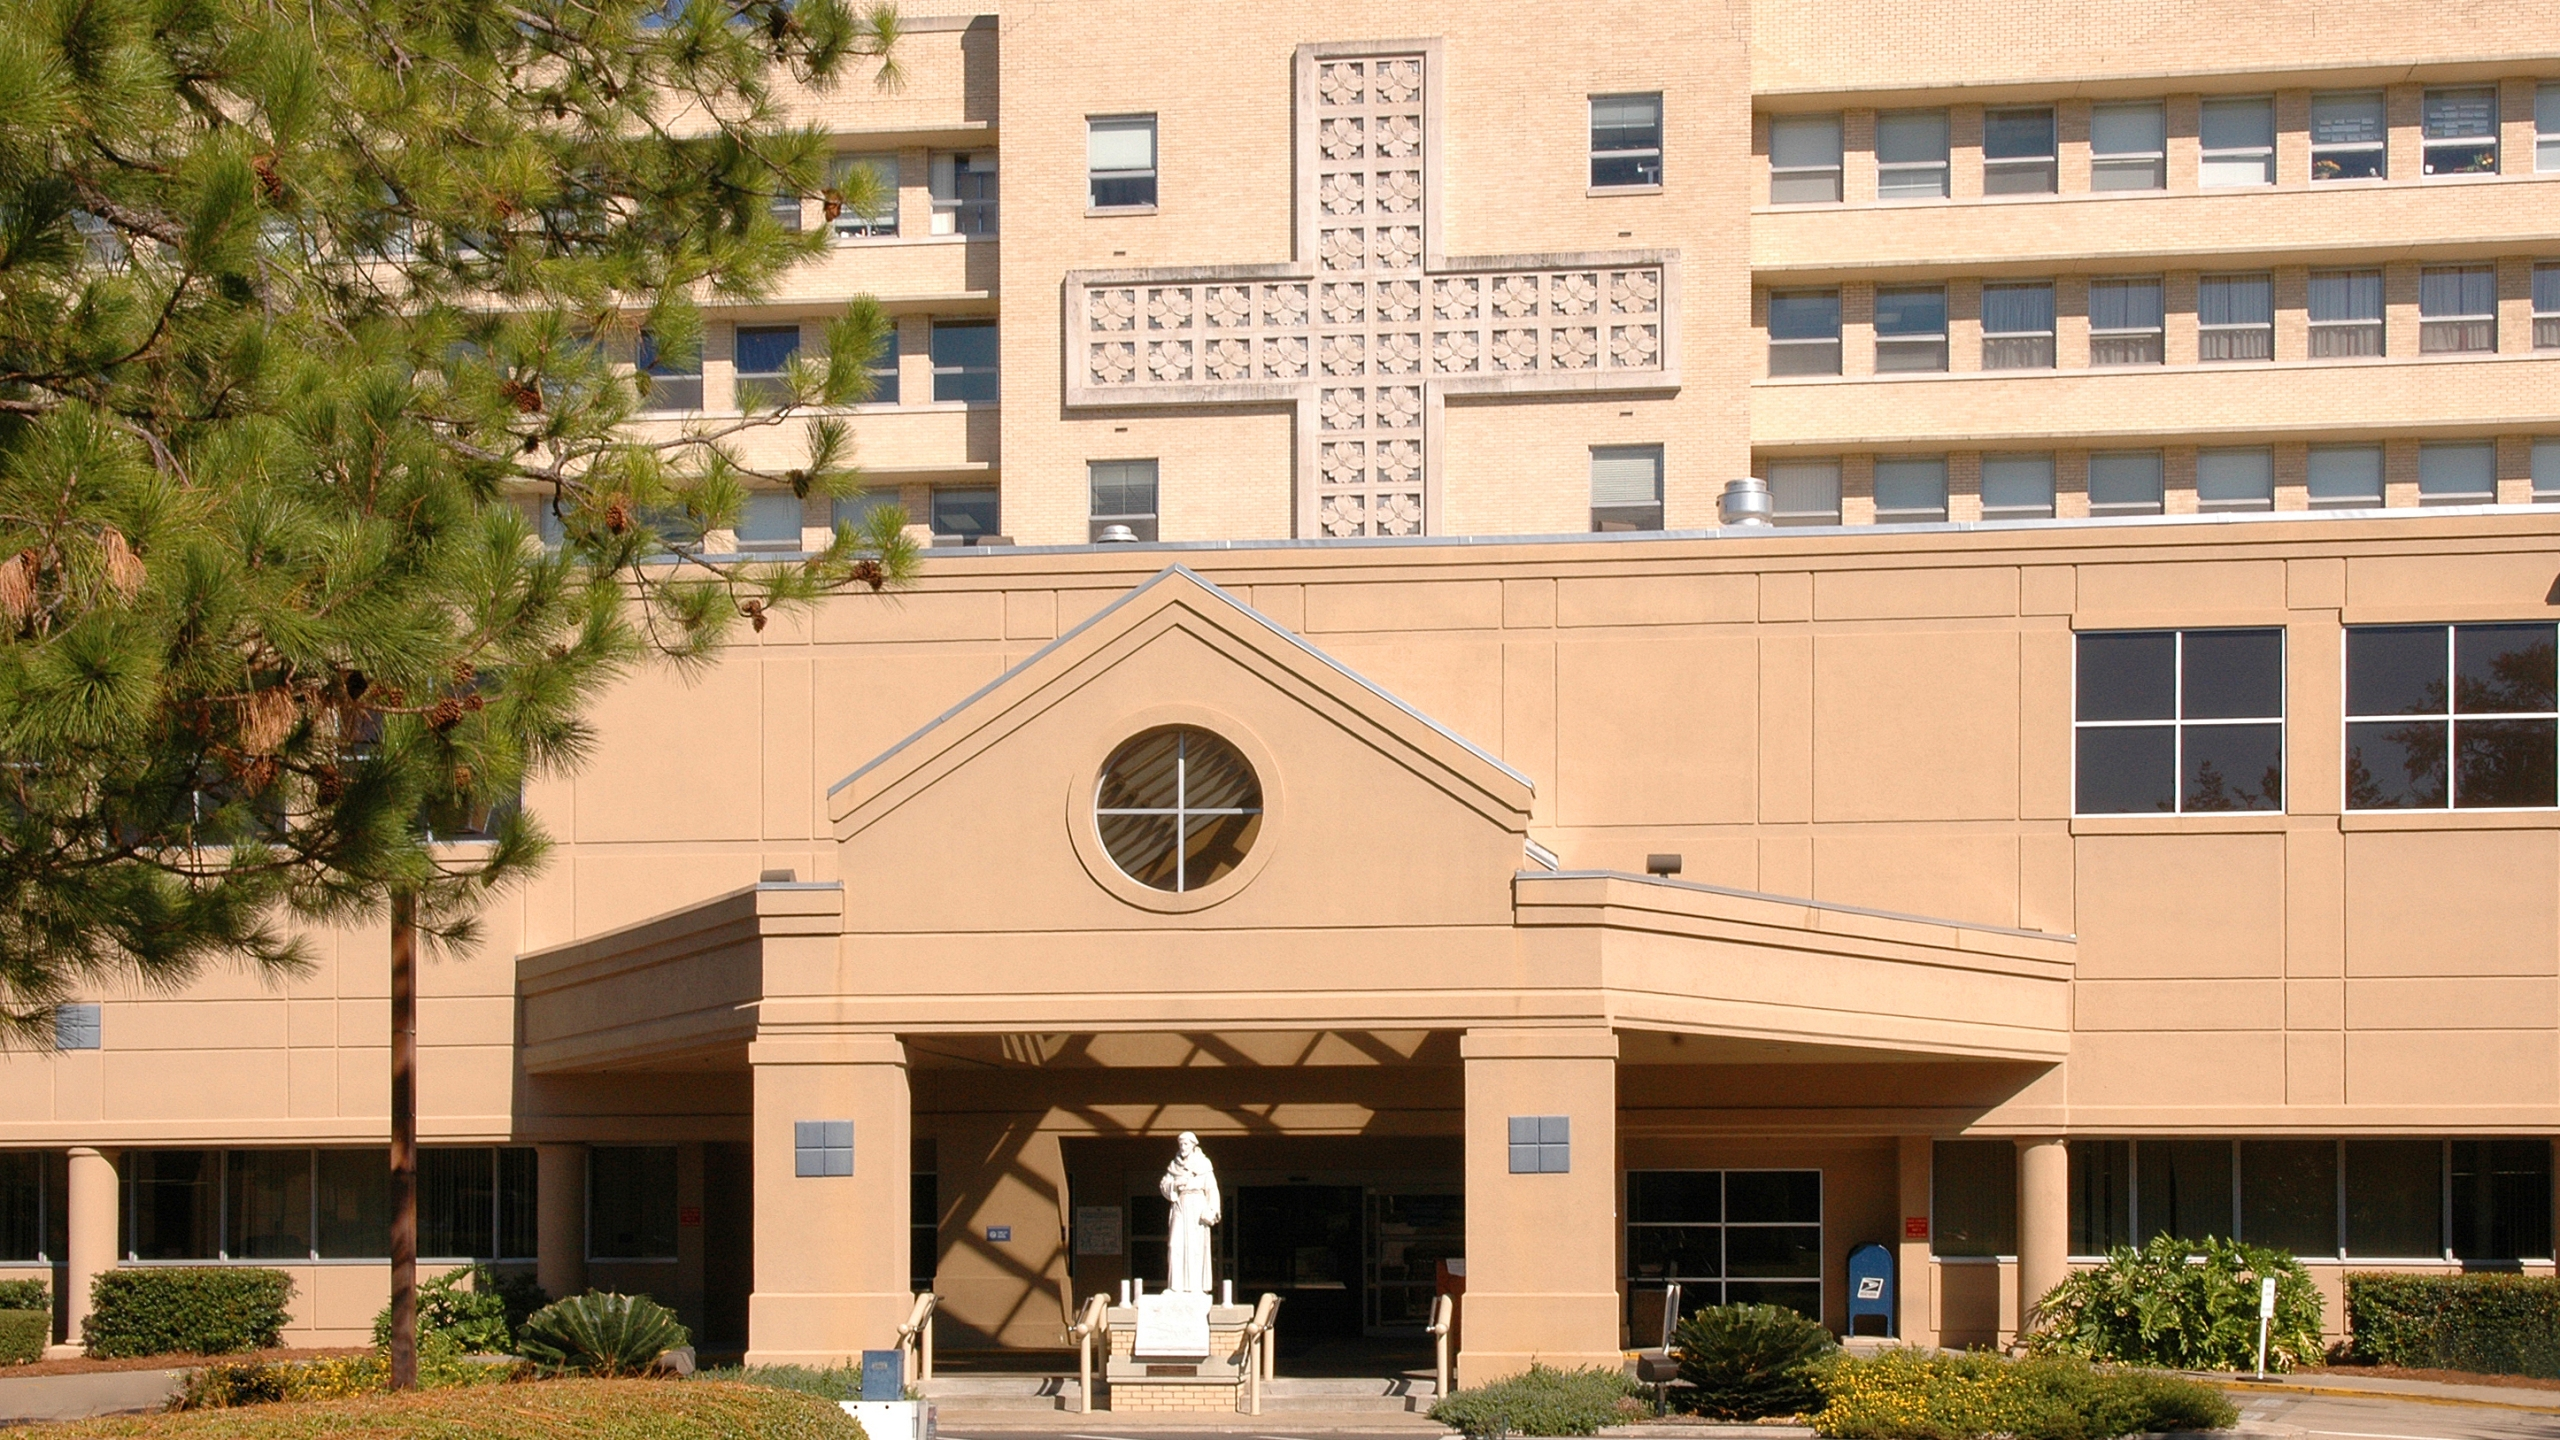 St. Francis Medical Center - Downtown_1524163694859.jpg.jpg